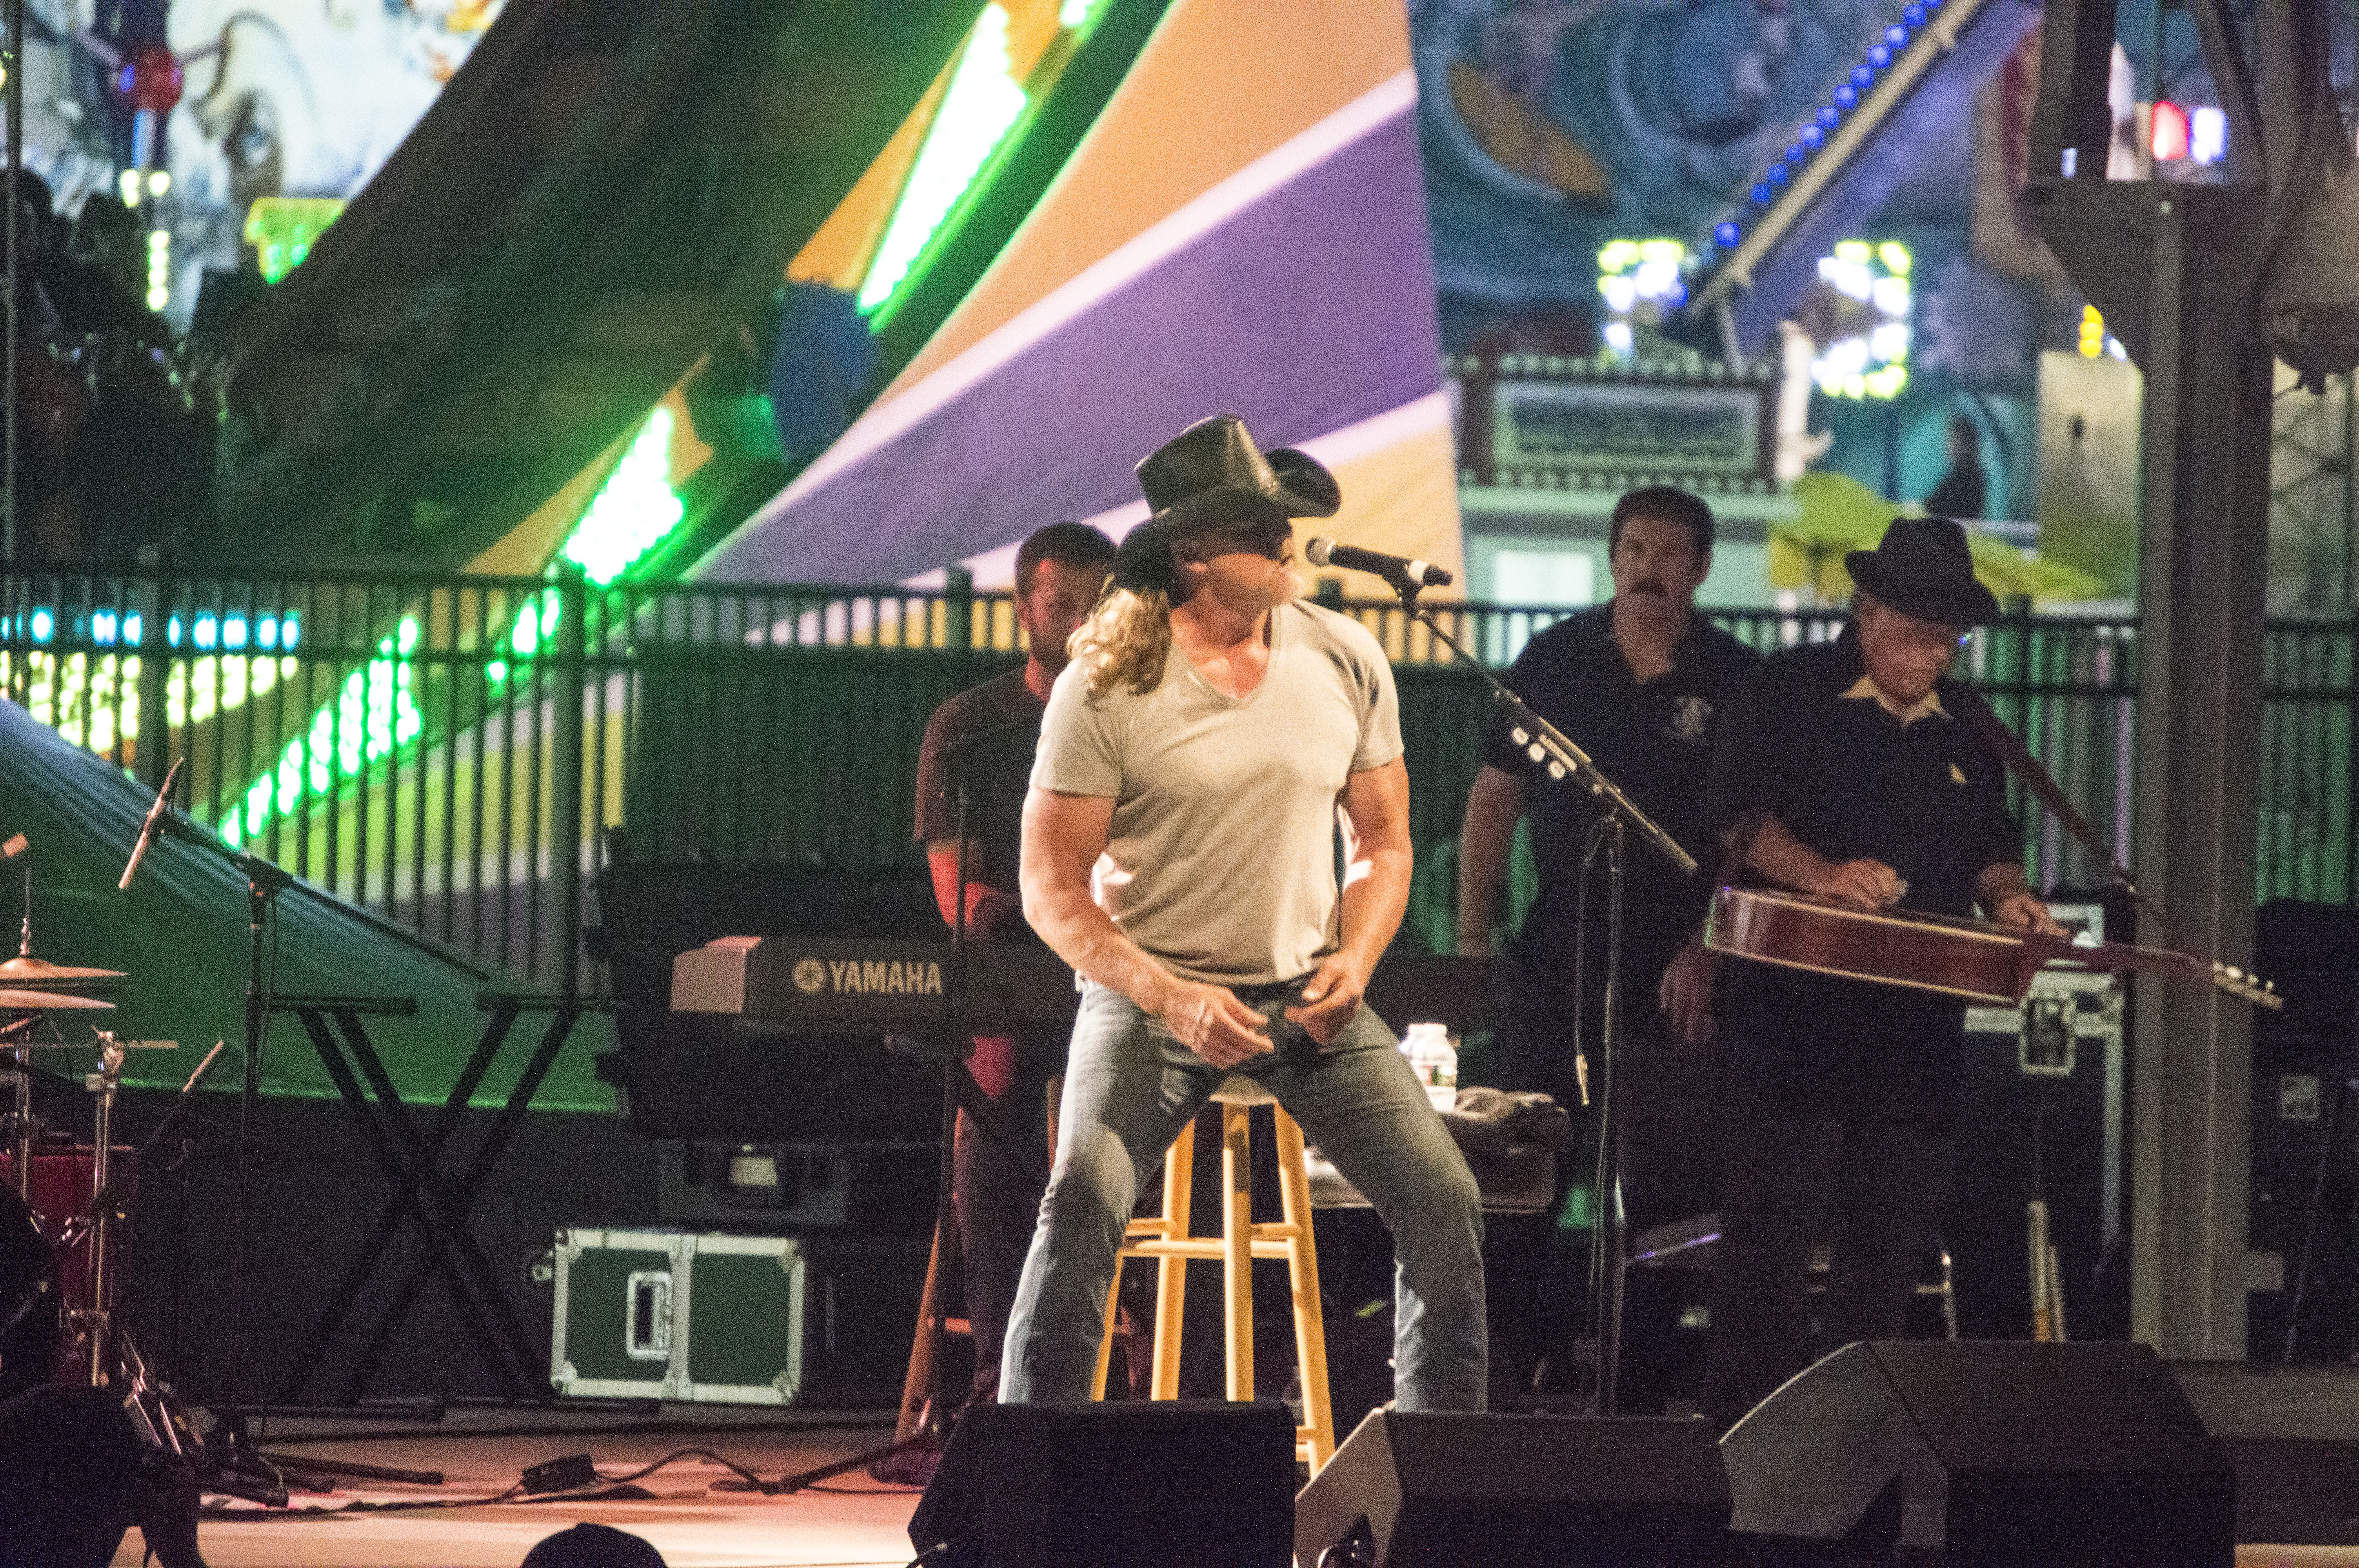 Trace Adkins Performs in Seaside Heights, N.J., July 13, 2016. (Photo: Daniel Nee/Shorebeat)